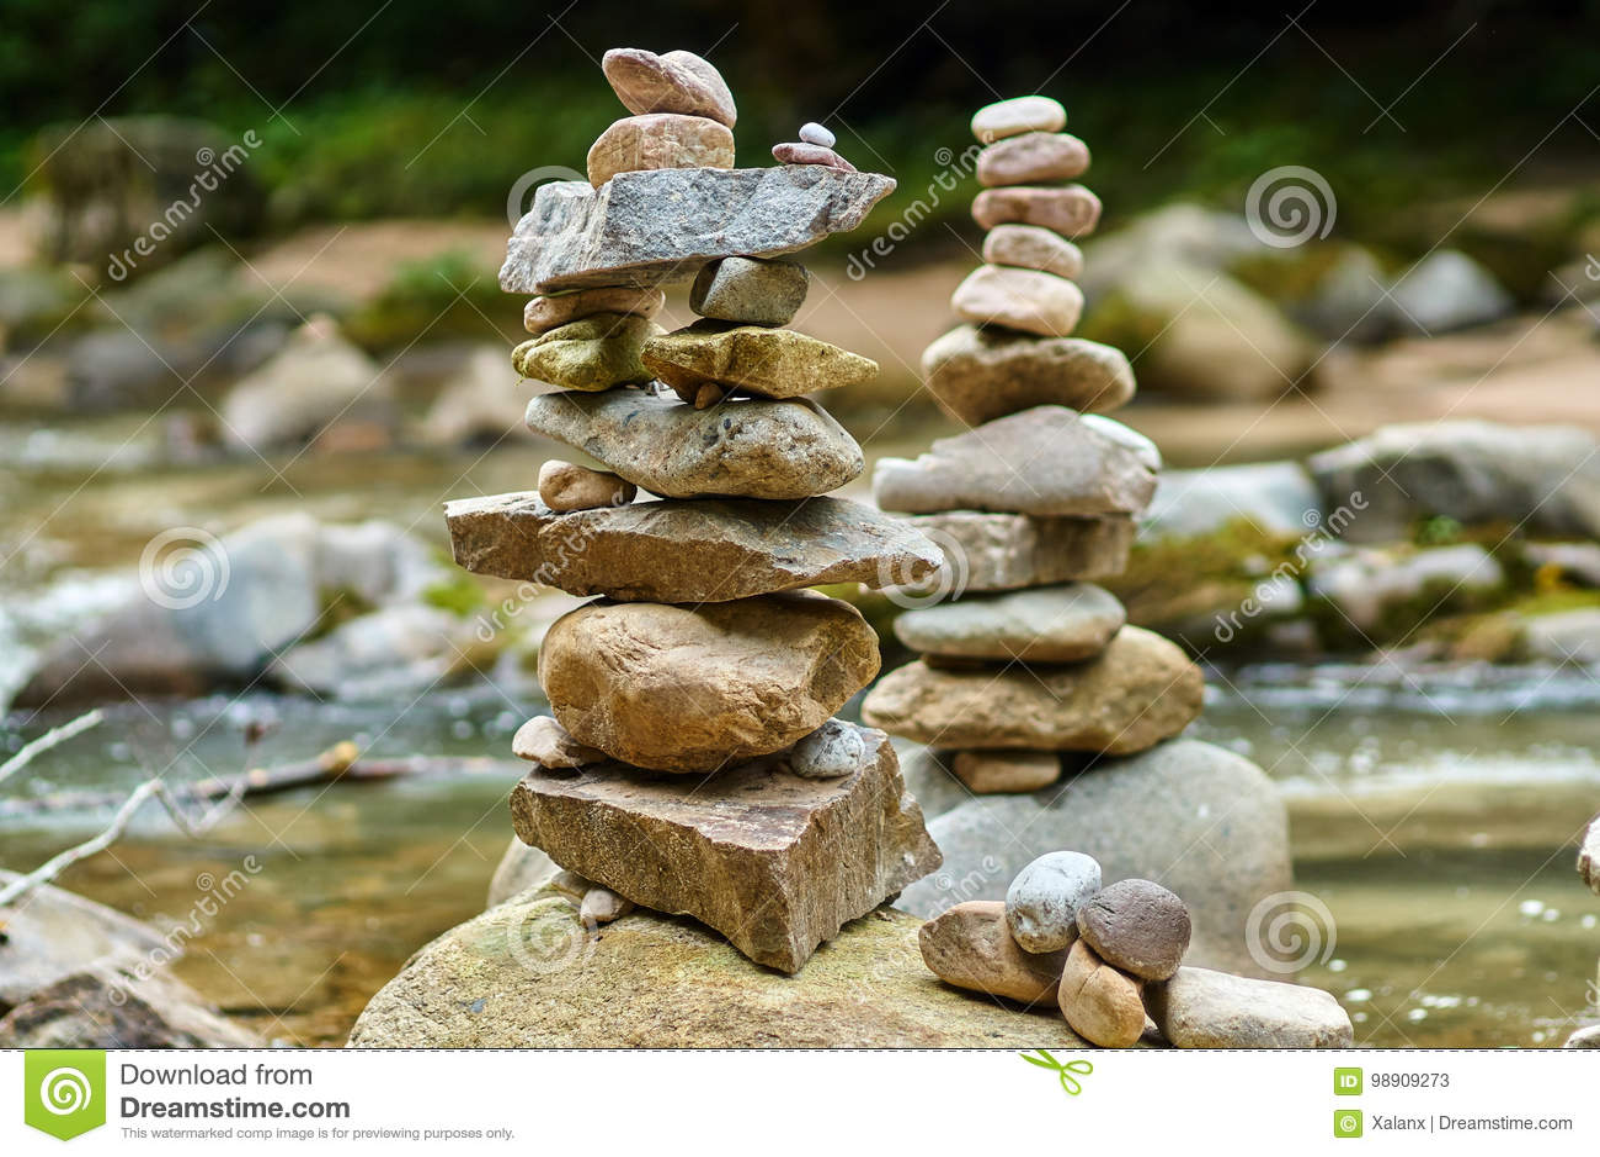 Stones arranged zen-like by the river